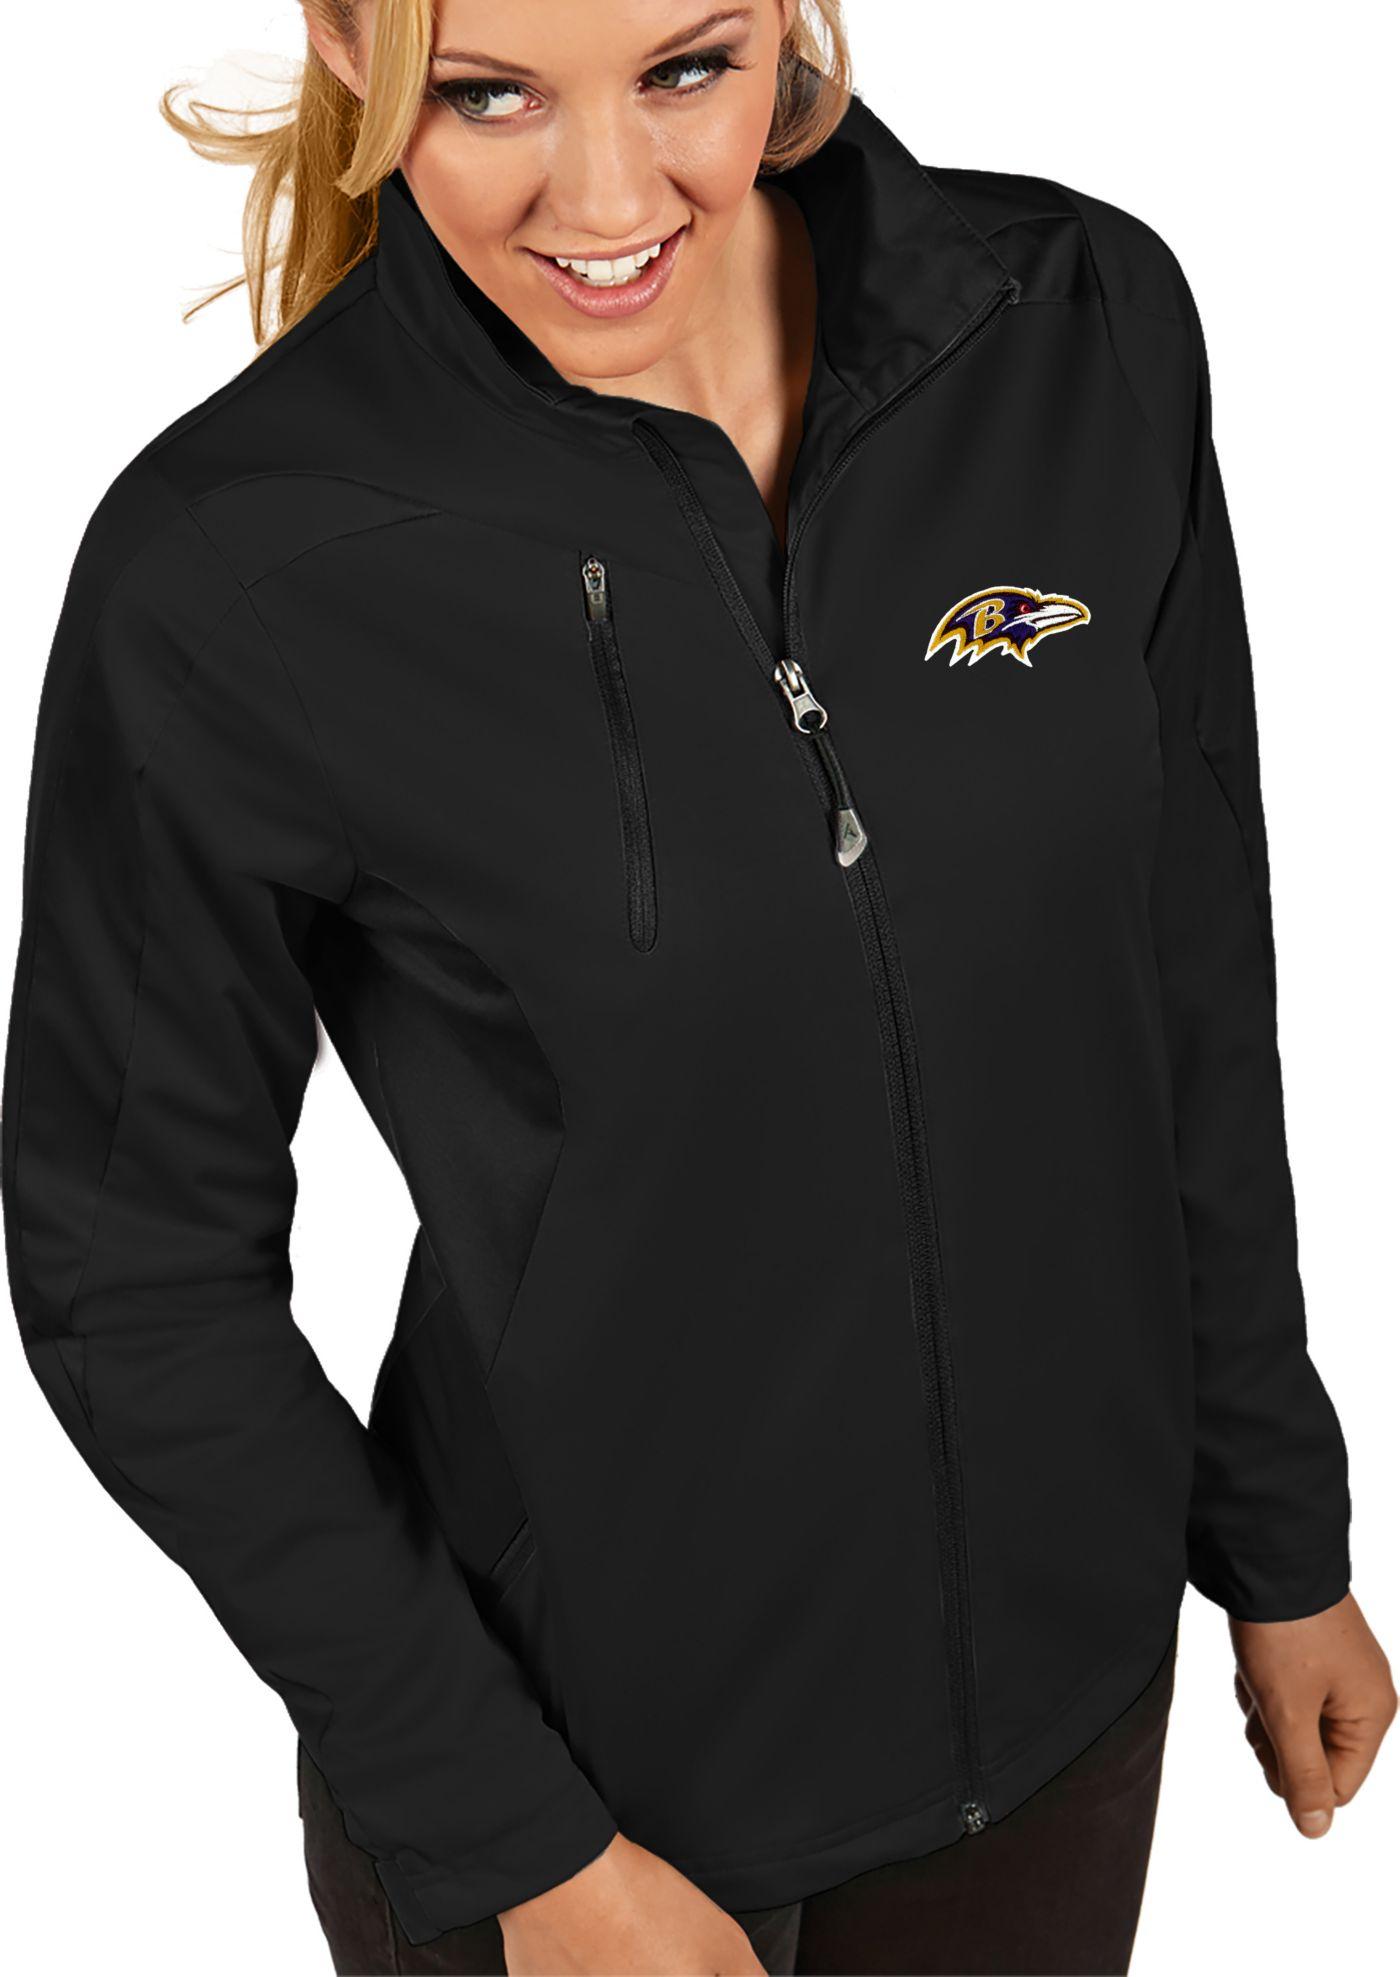 Antigua Women's Baltimore Ravens Discover Full-Zip Black Jacket